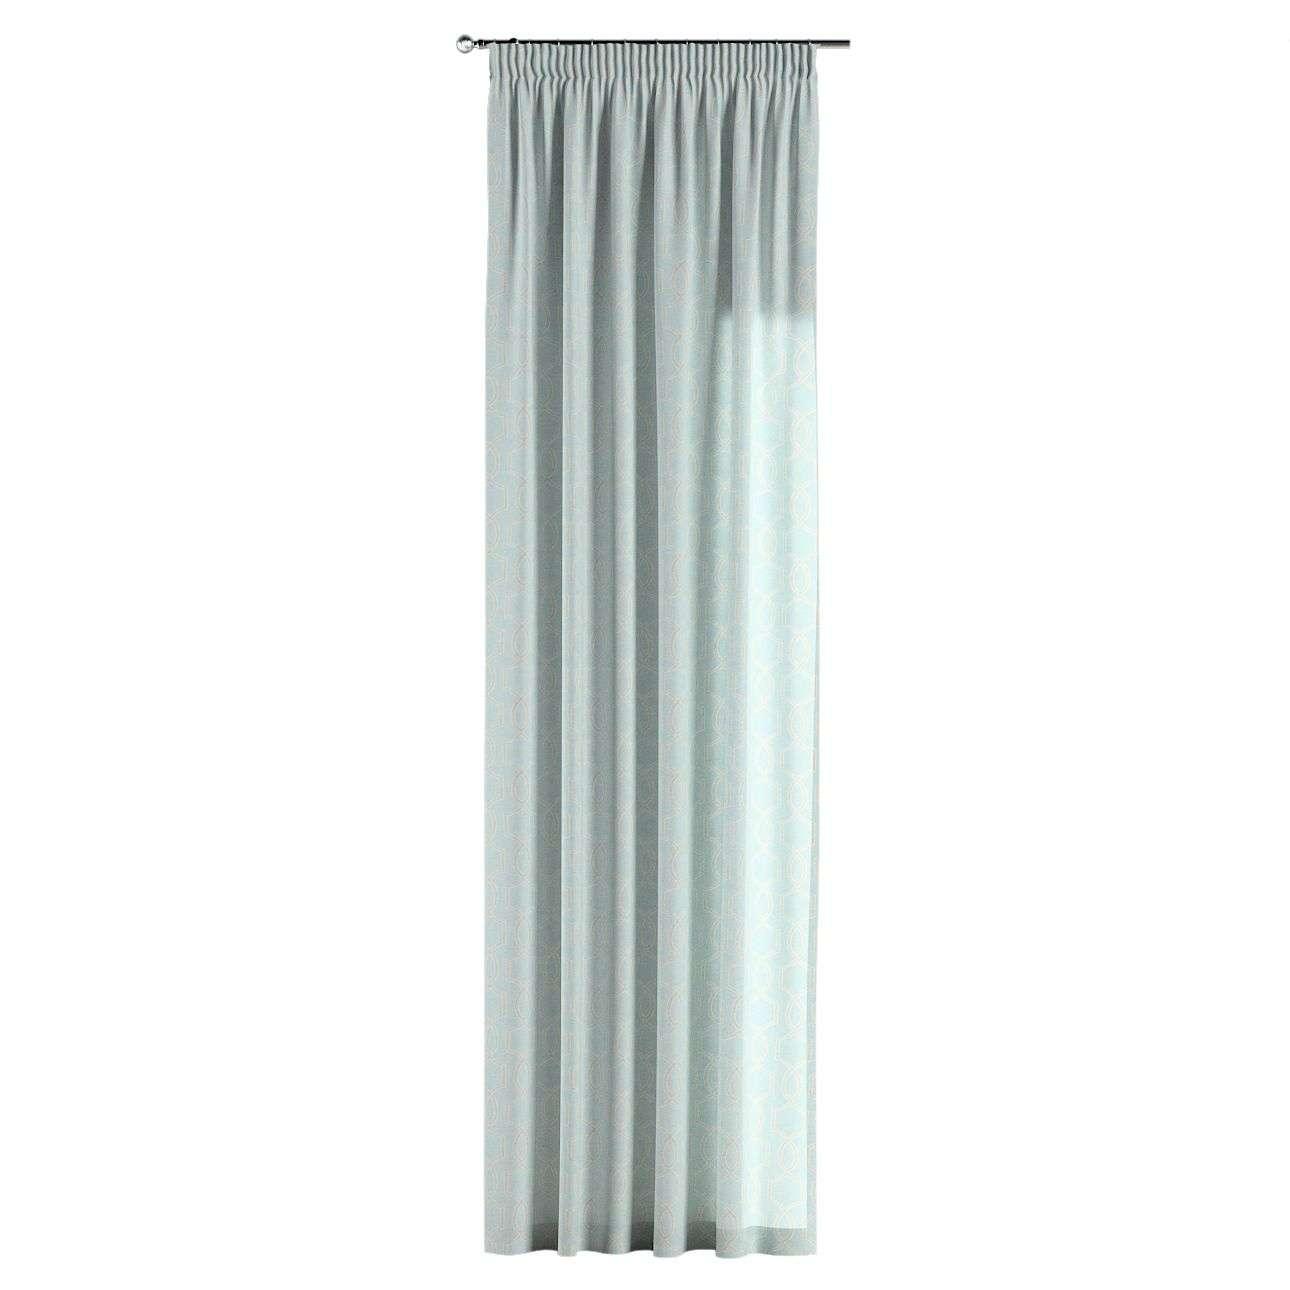 Gardin med rynkebånd 130 x 260 cm fra kollektionen Comics, Stof: 141-24